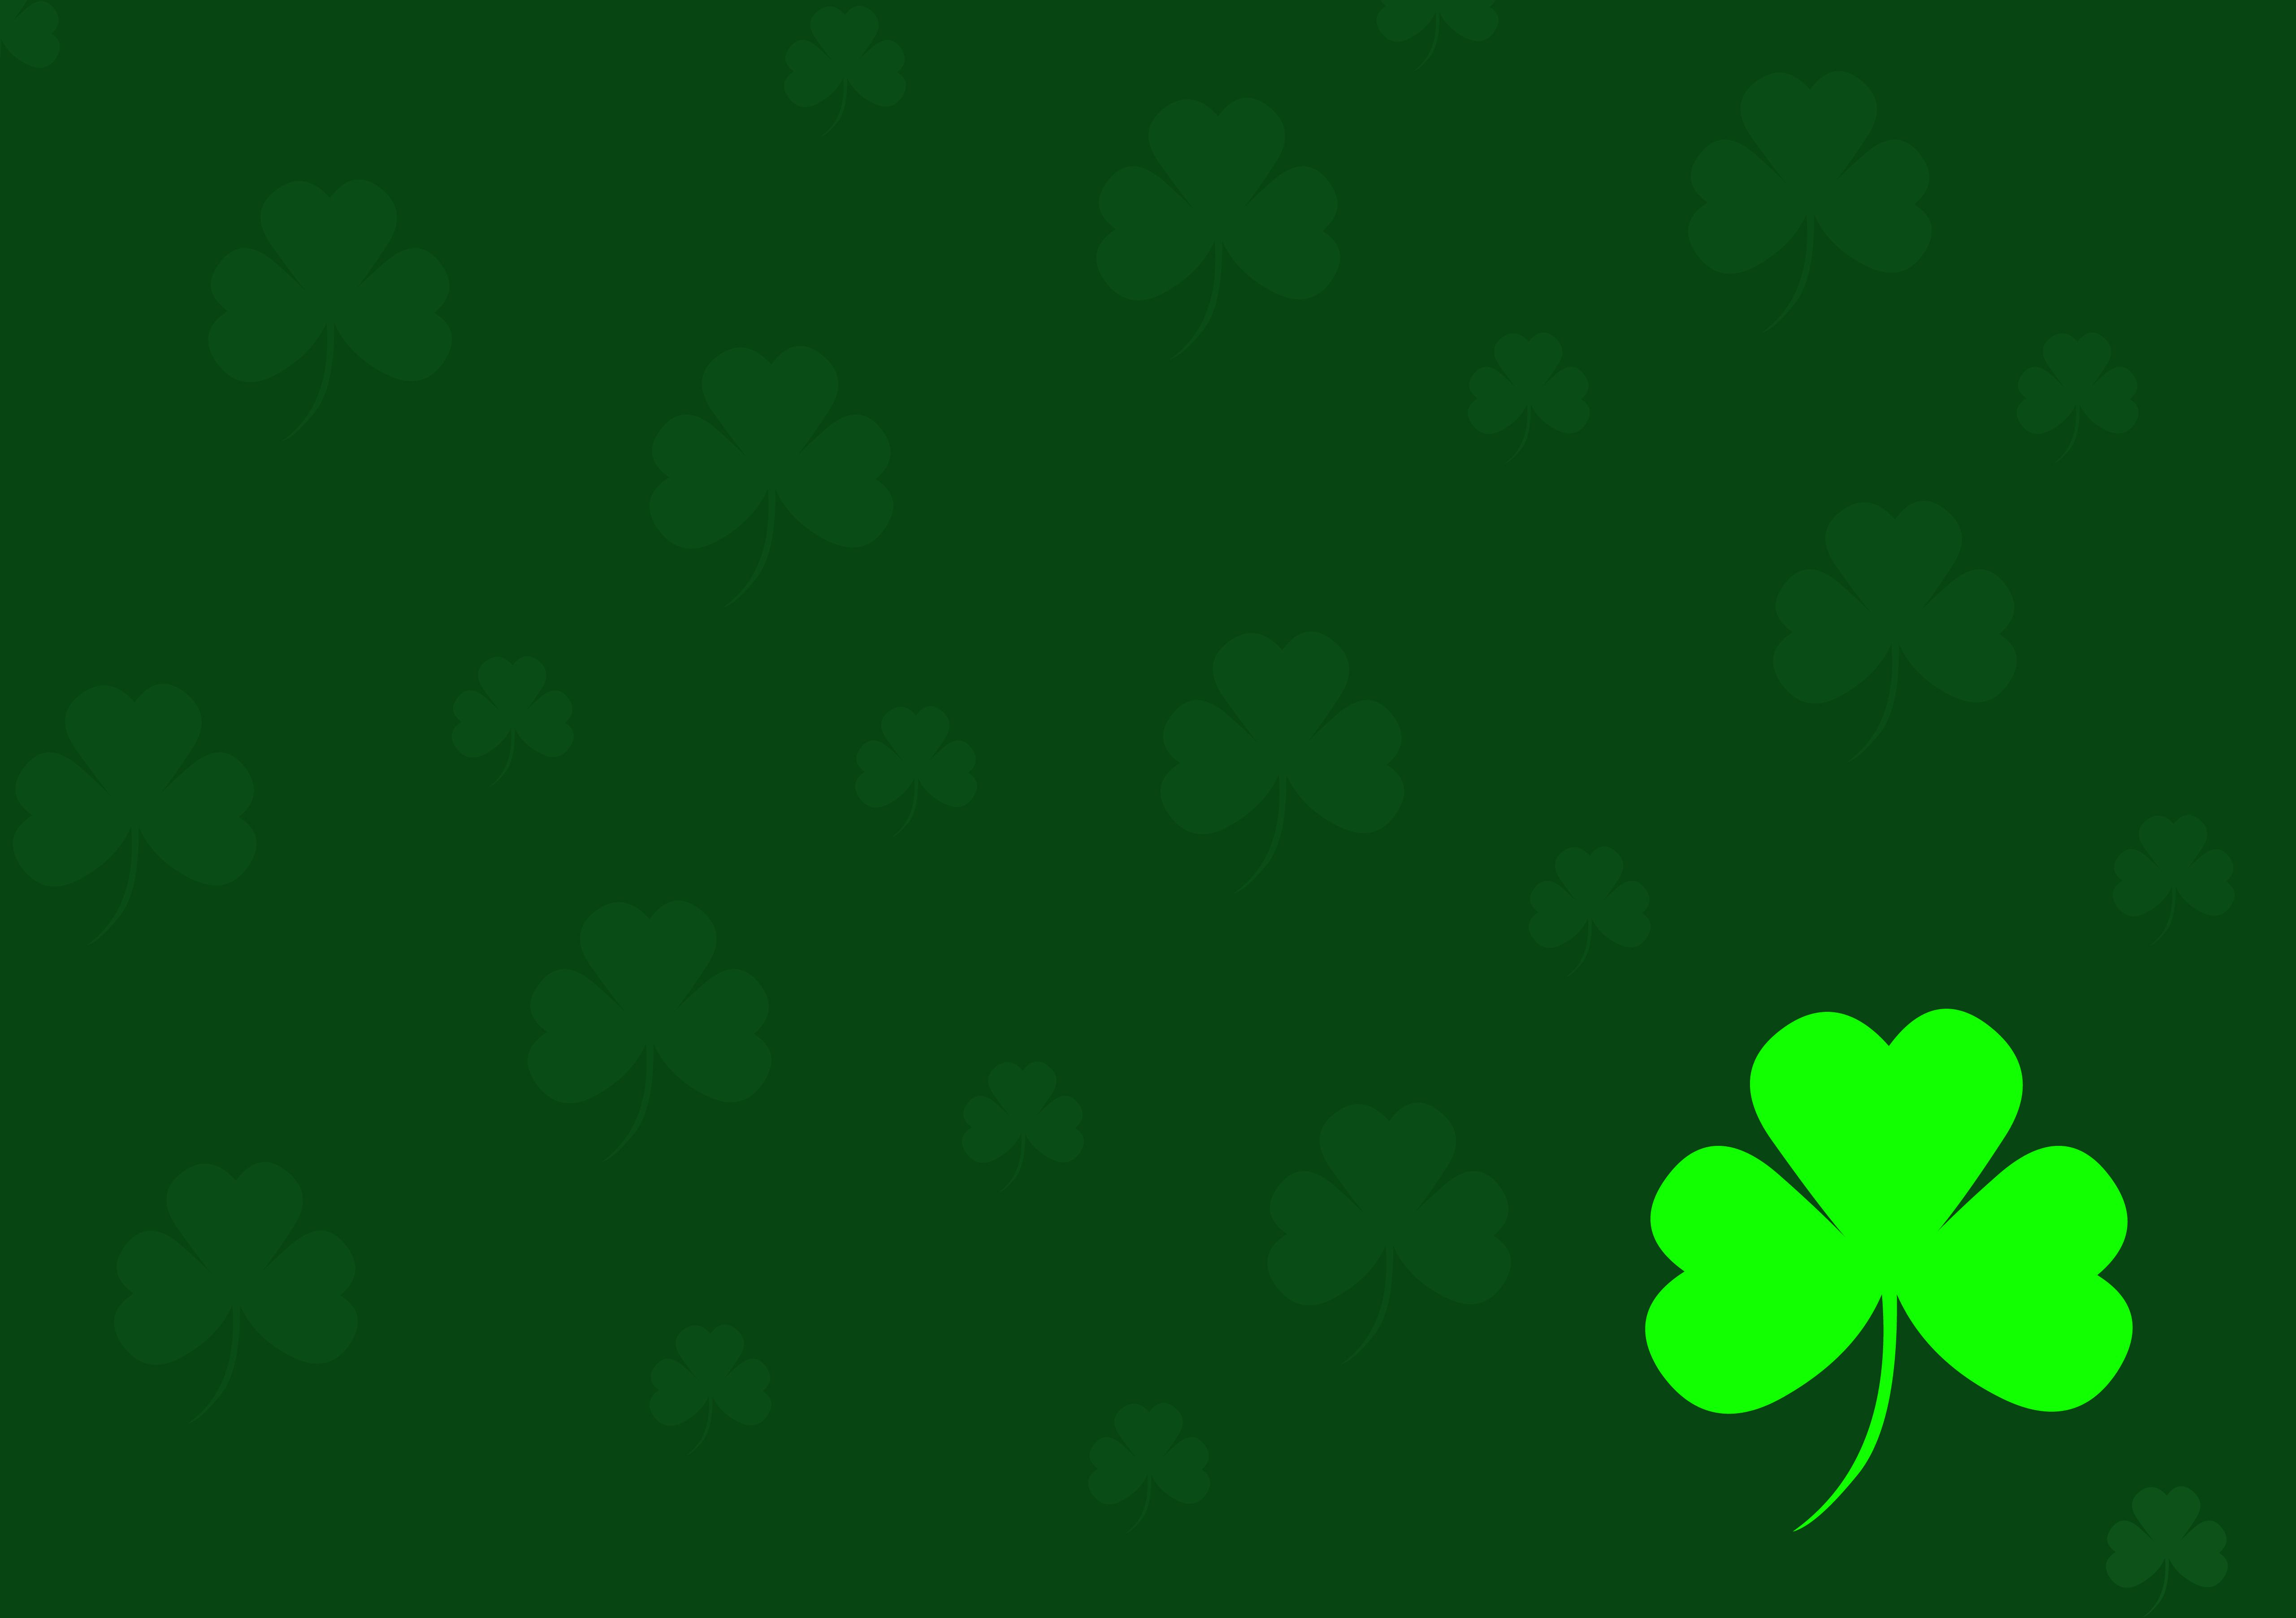 St Patricks Day Images St Patricks Day Backgrounds 5122x3609